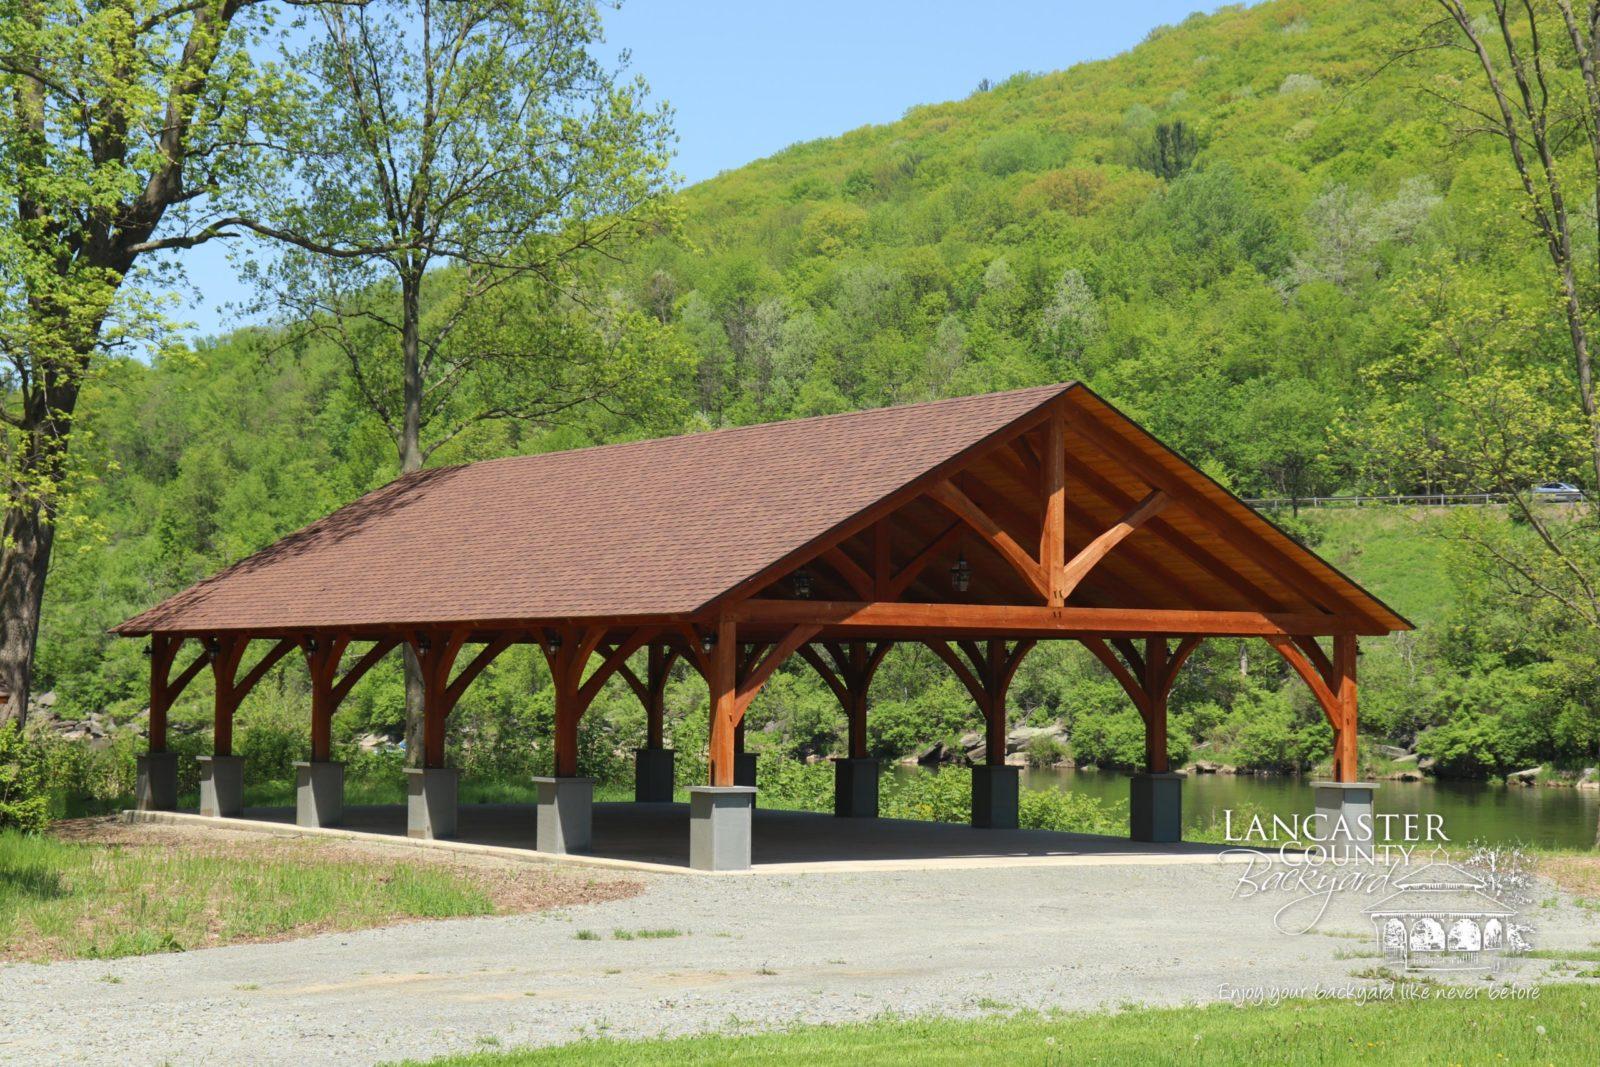 timber frame pavilion in a park